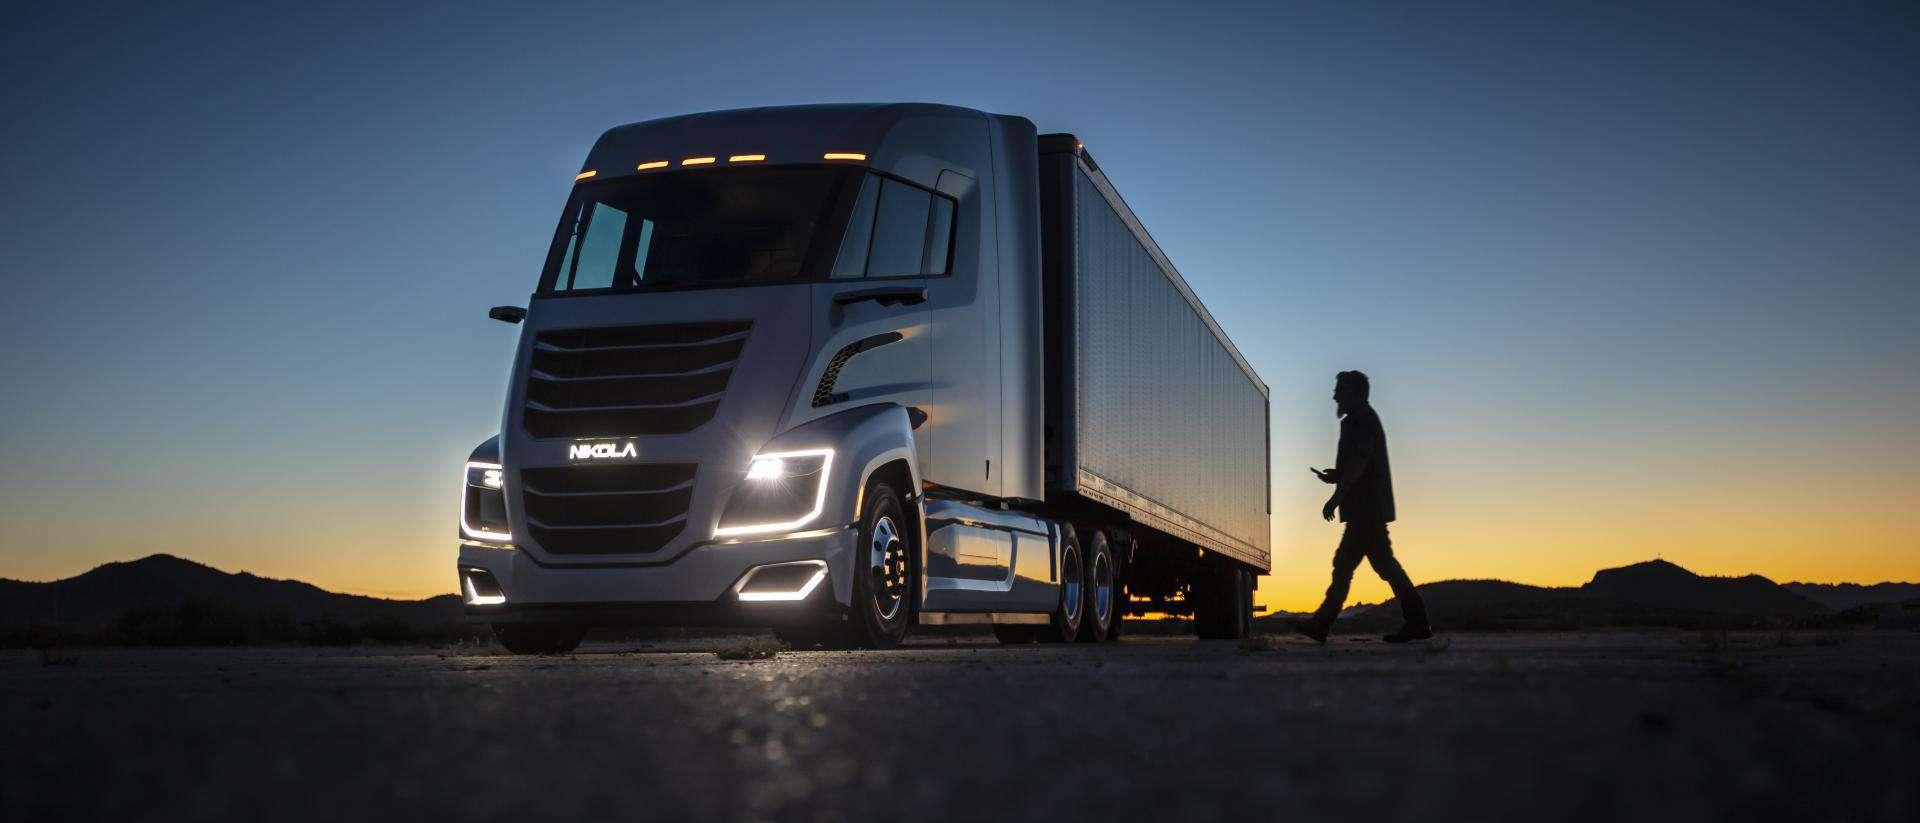 Nikola: GM verzögert Deal / Worthington verkauft alle Aktien; macht hunderte Millionen Gewinn